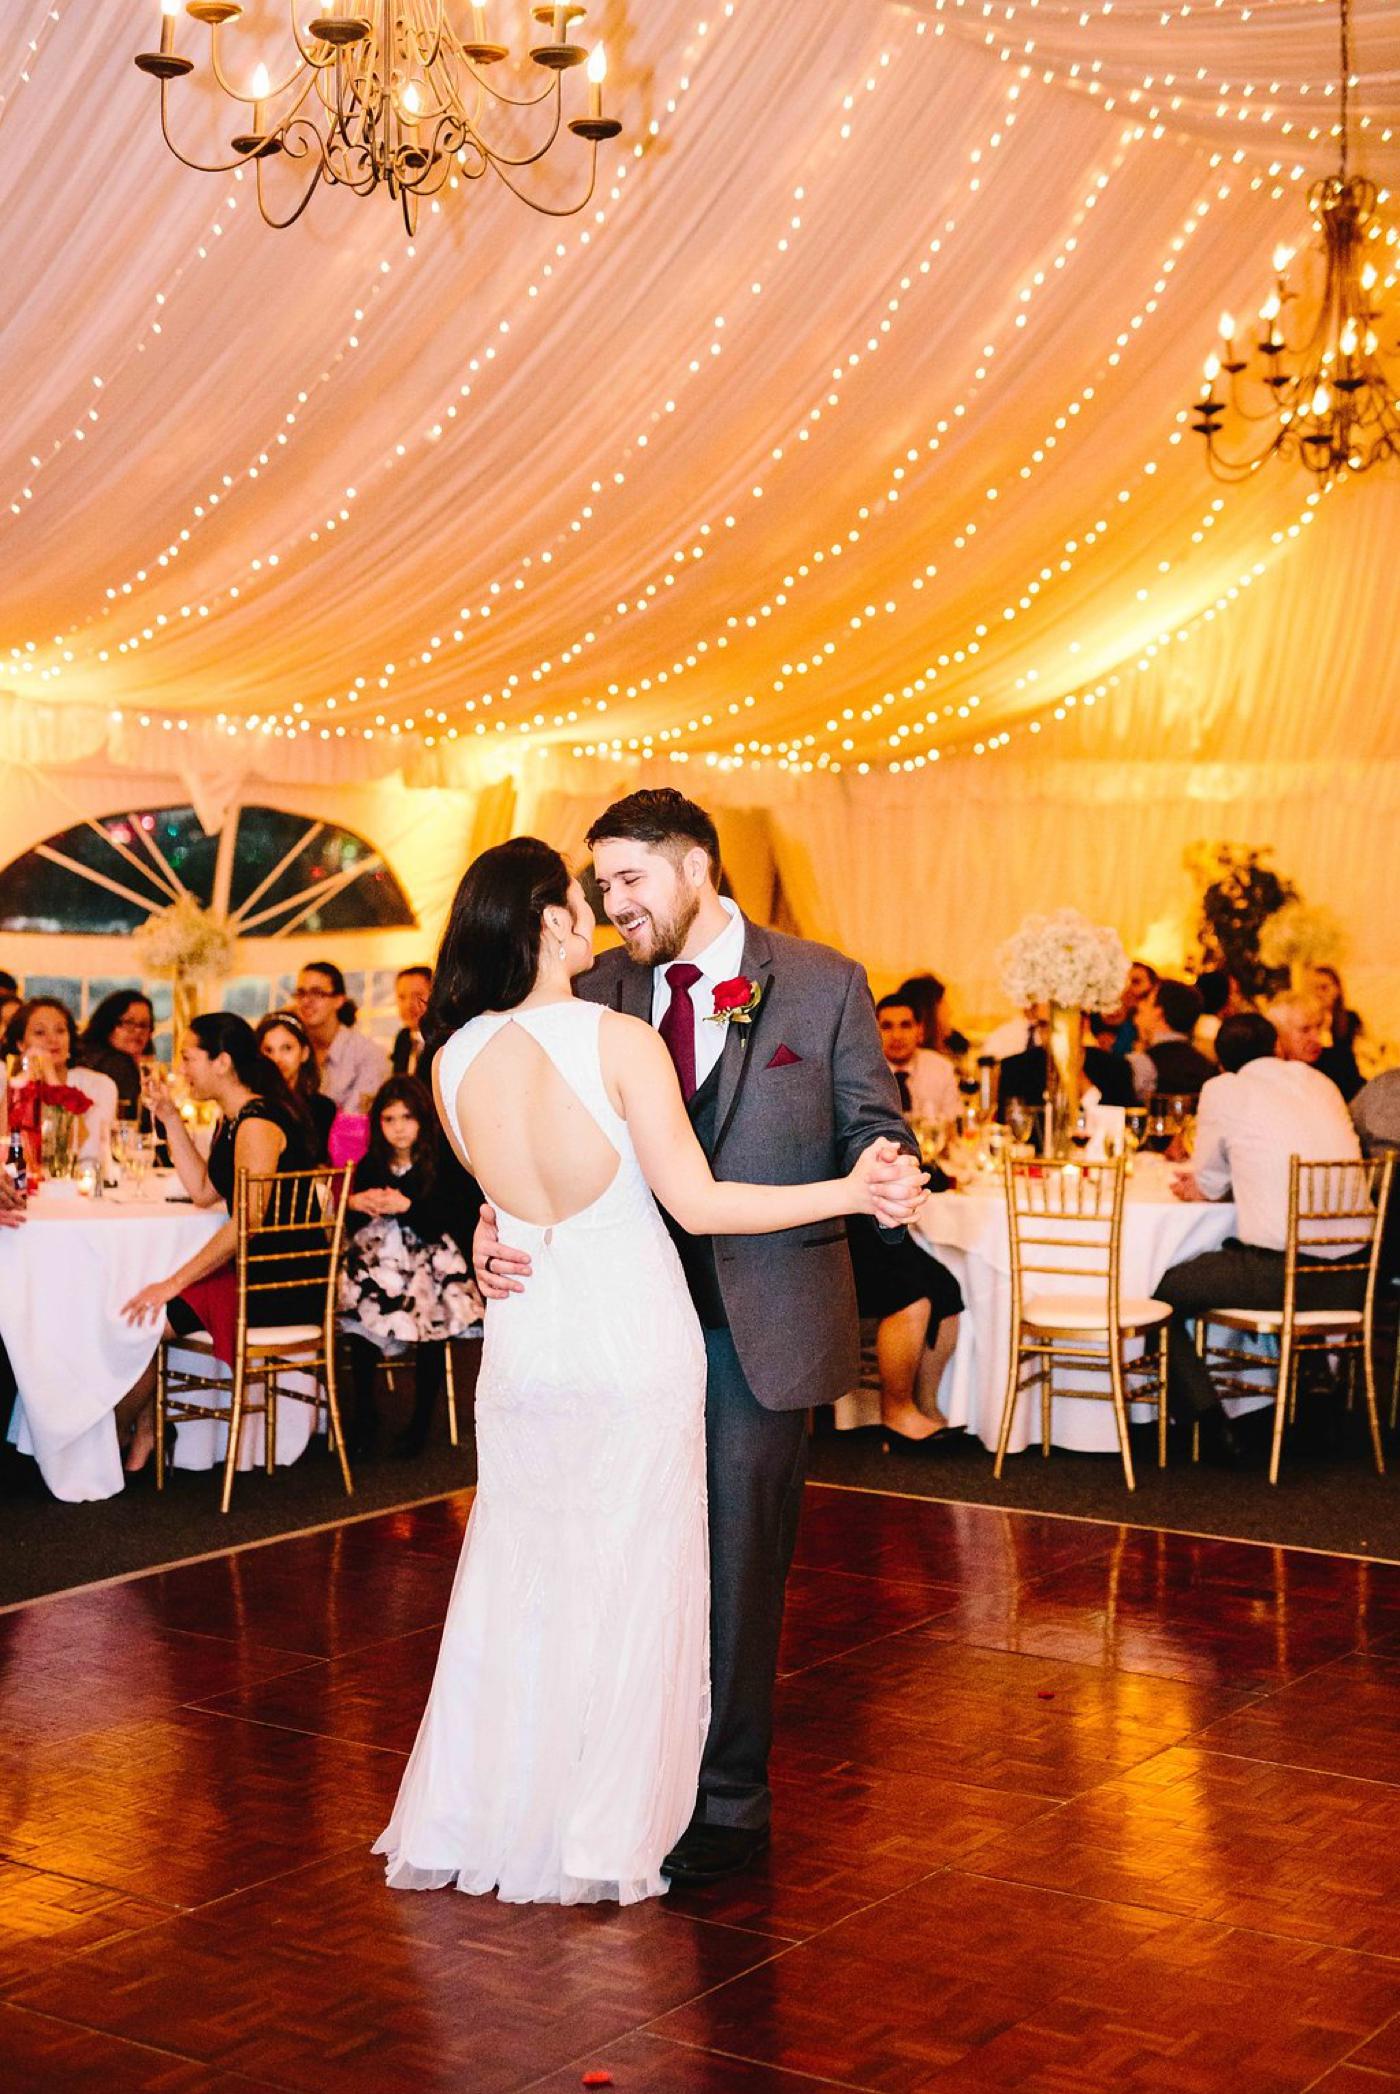 chicago-fine-art-wedding-photography-bolotin34